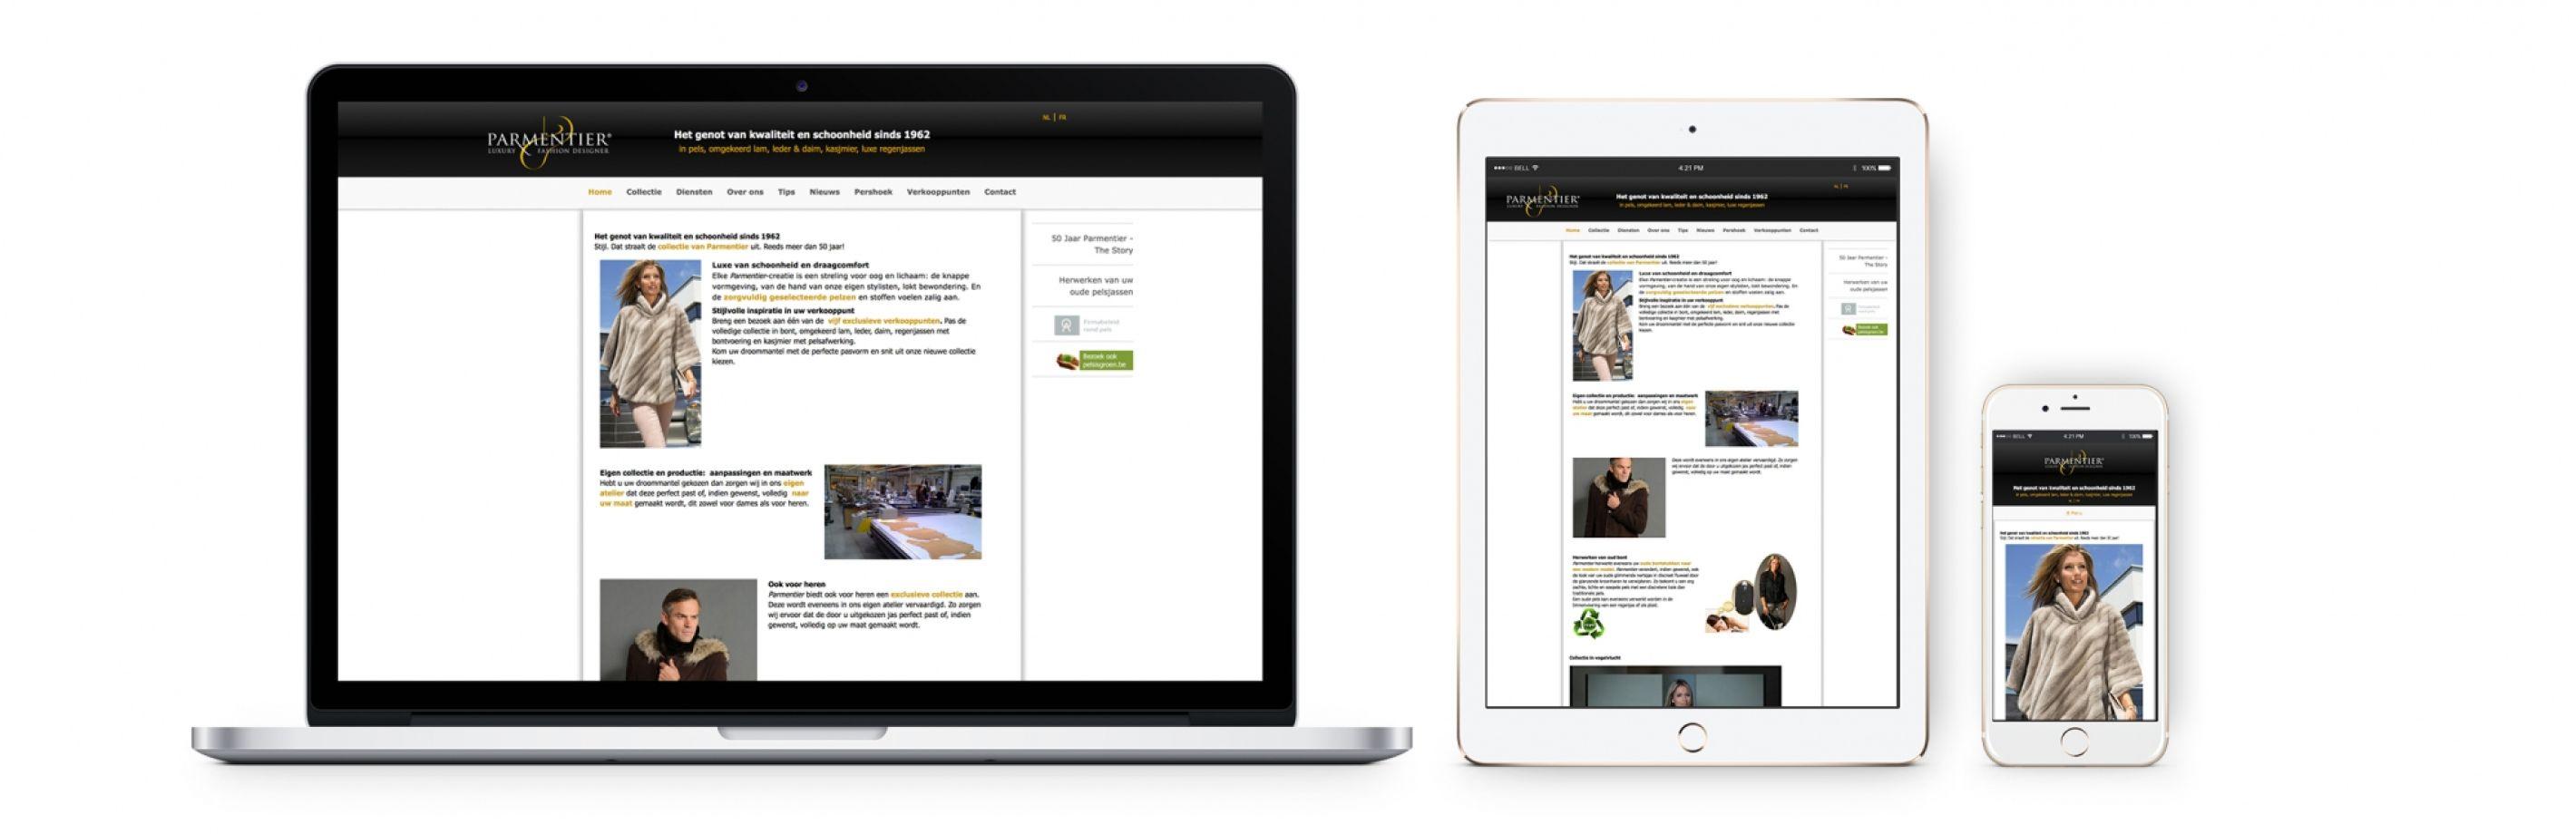 Parmentier website